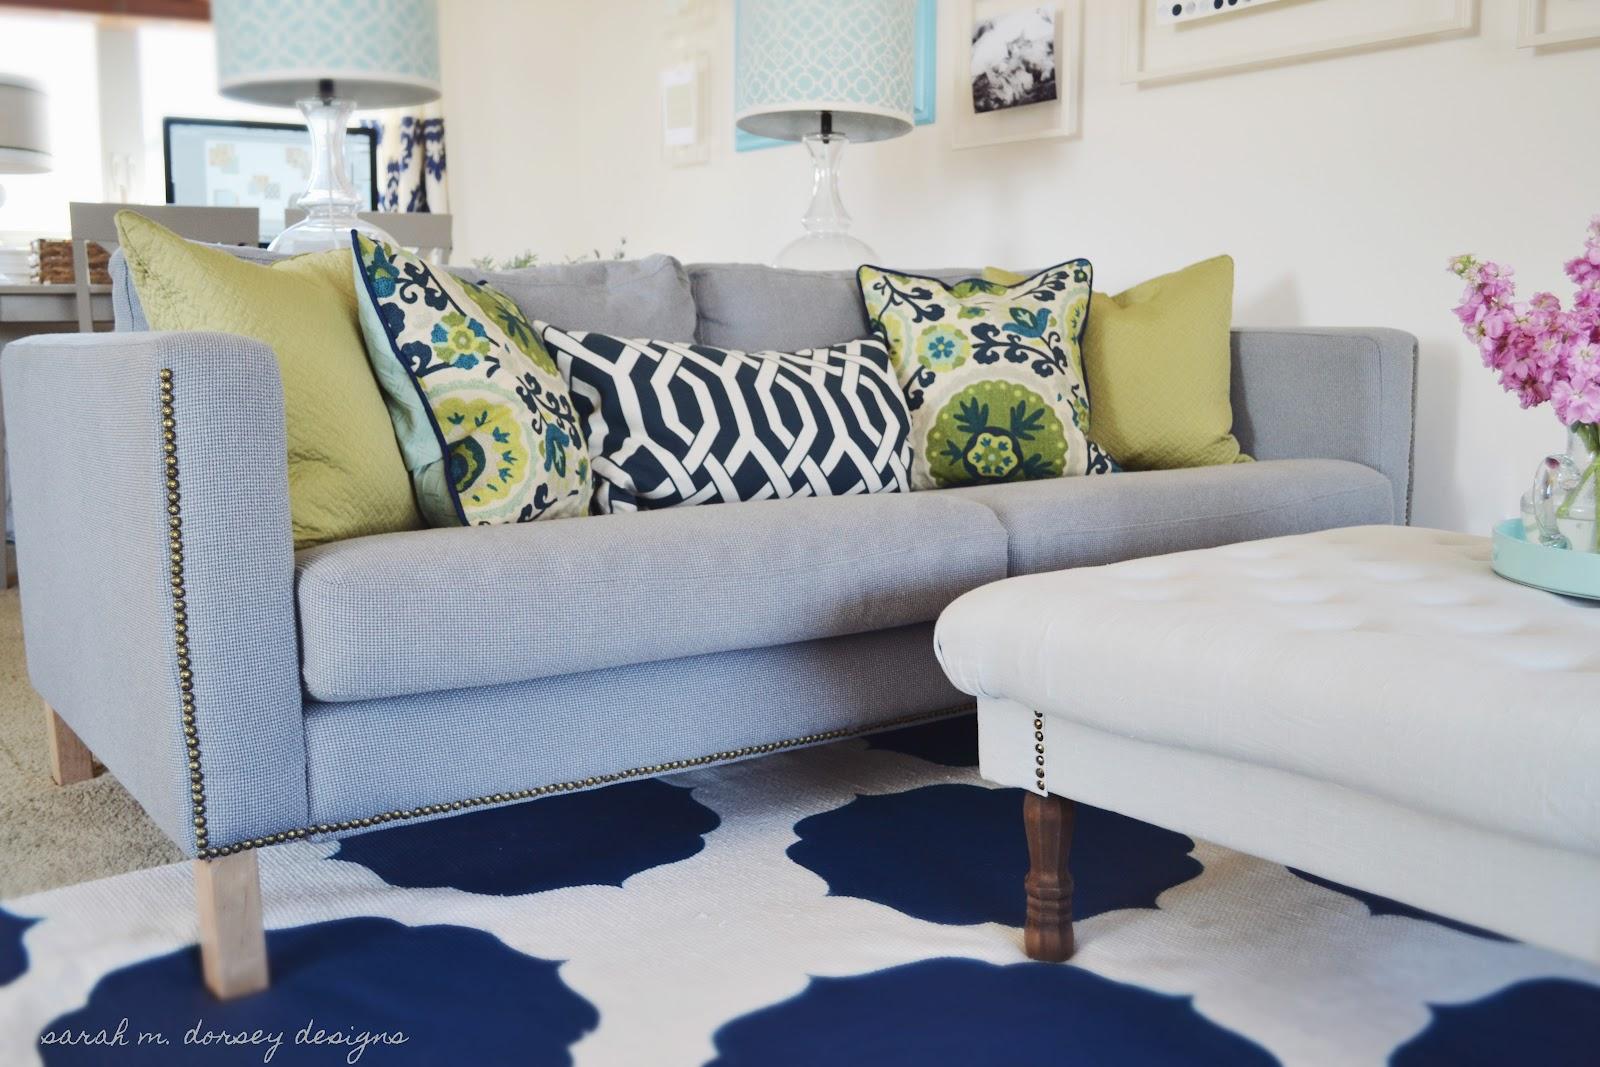 sarah m dorsey designs karlstad sofa with nailhead trim. Black Bedroom Furniture Sets. Home Design Ideas